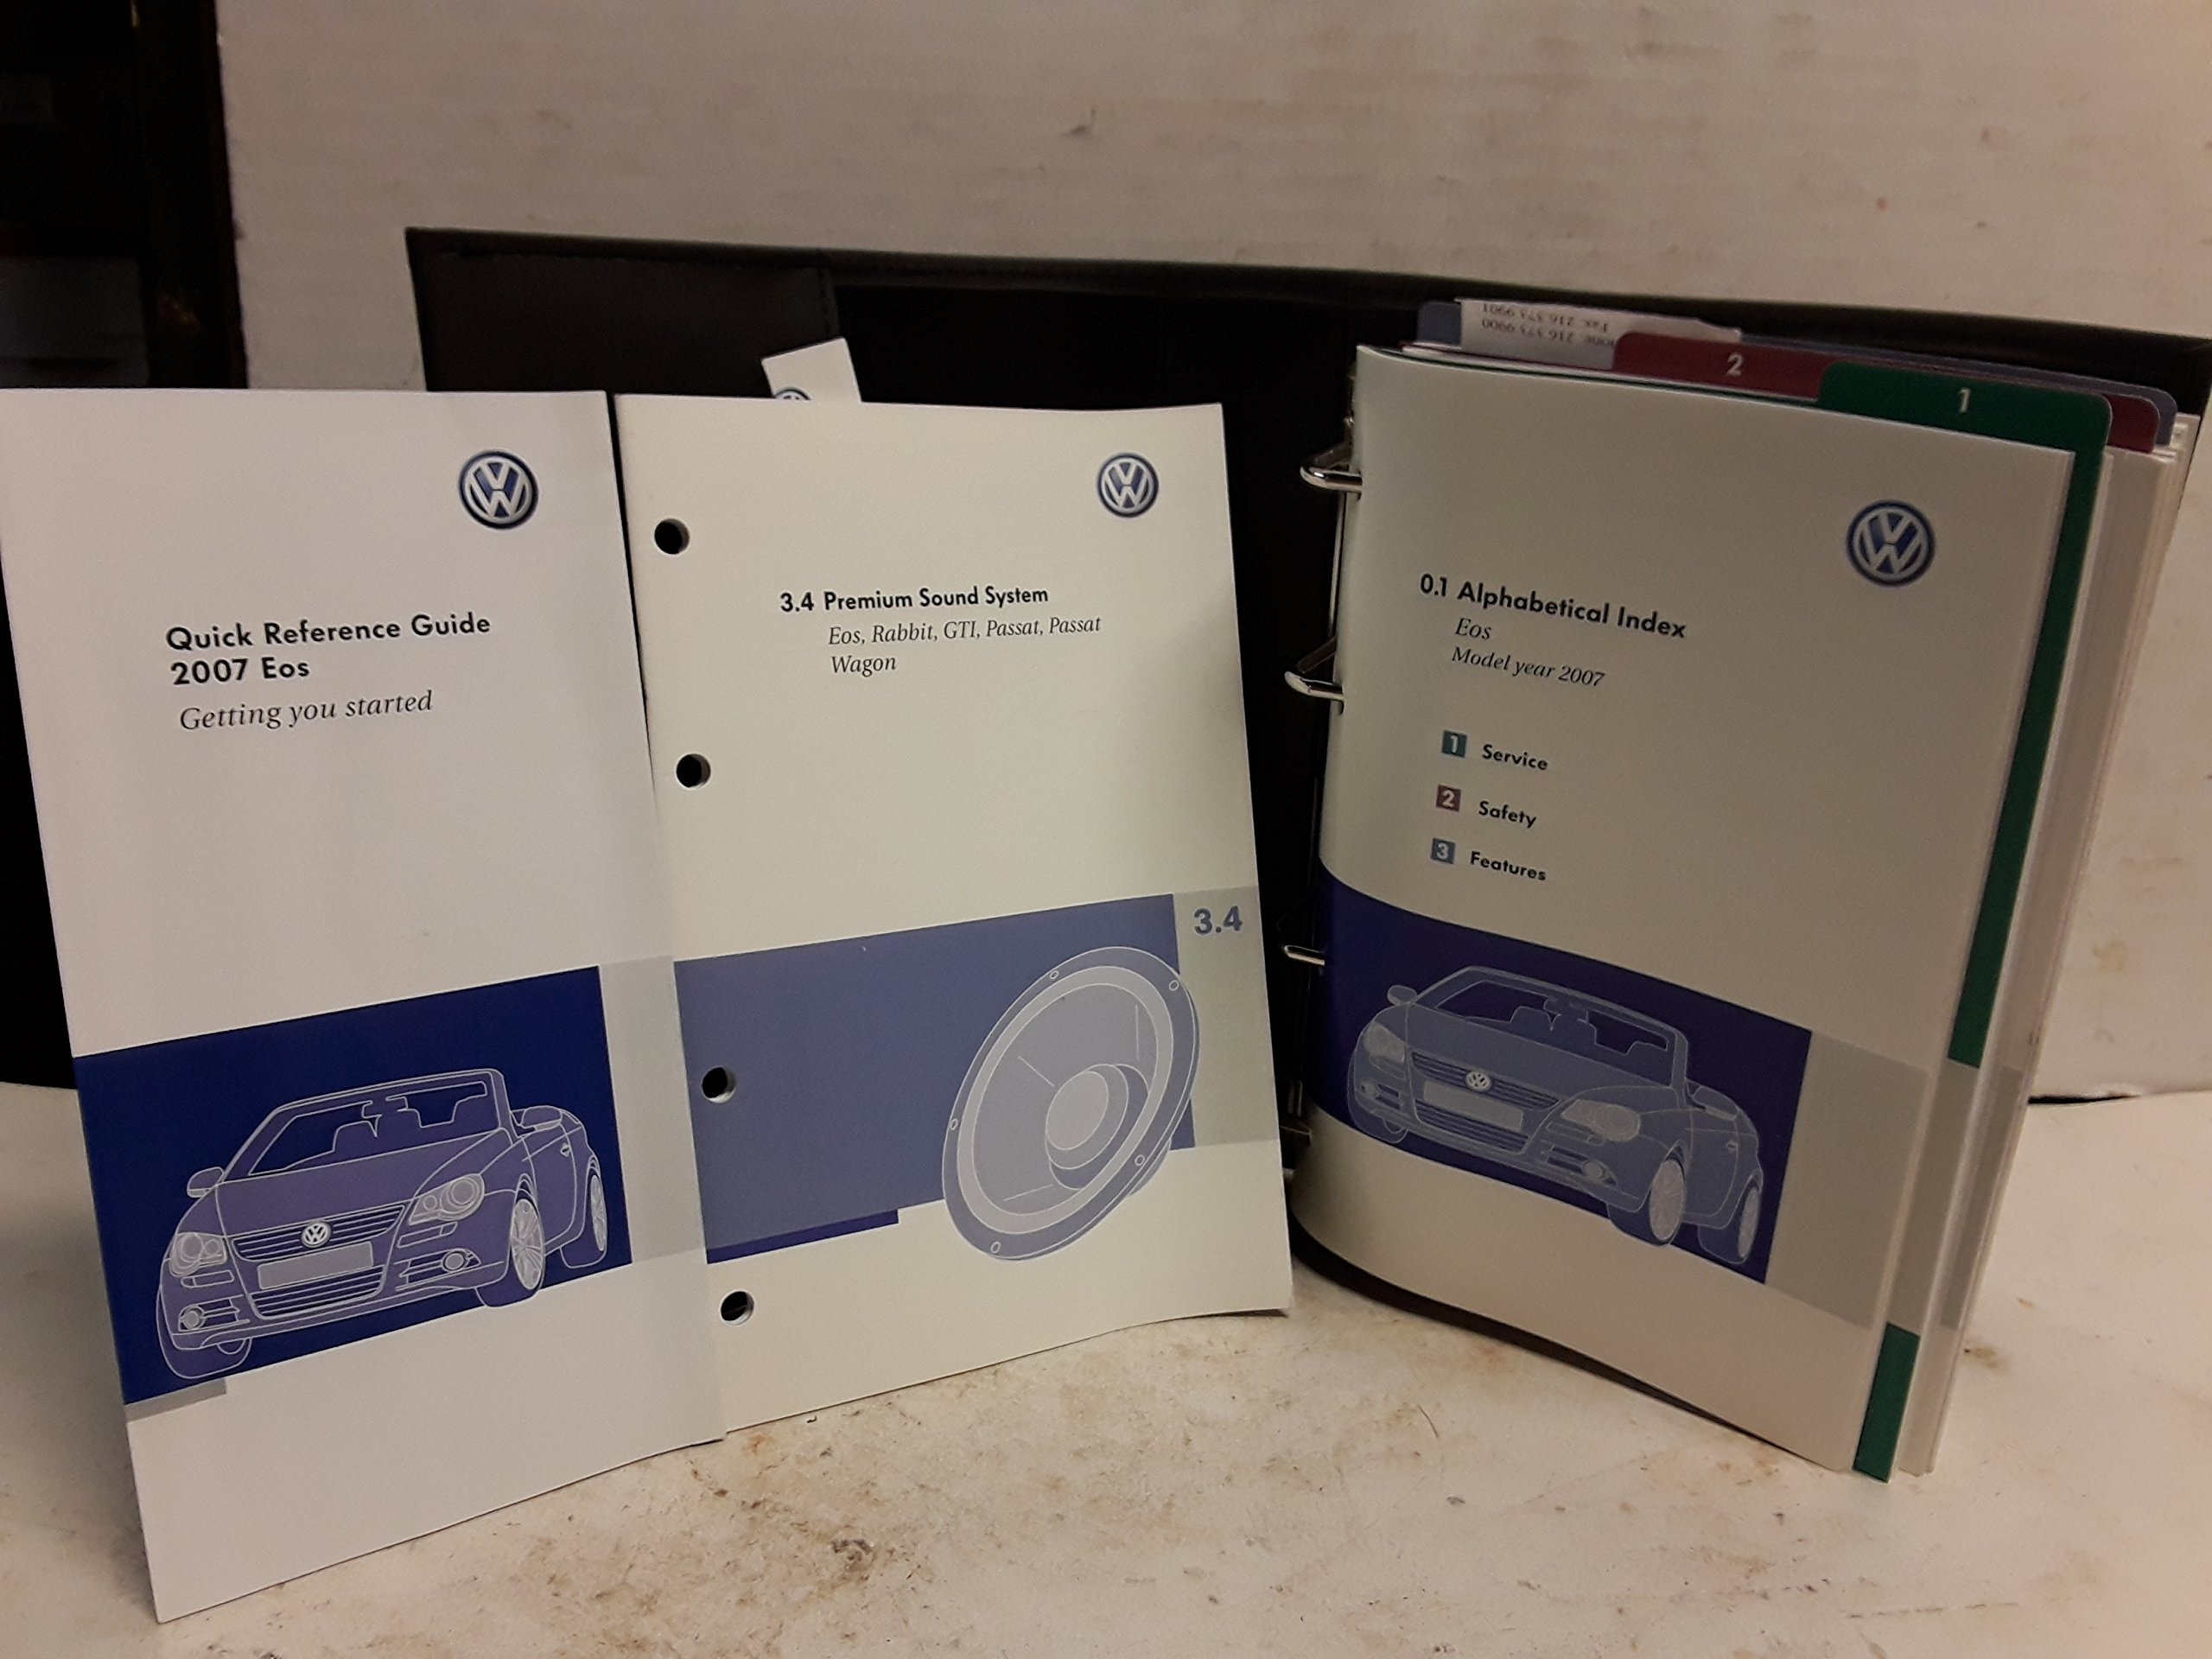 2007 volkswagen eos owners manual volkswagen amazon com books rh amazon com Owner's Manual VW Eos 2007 vw eos owners manual pdf